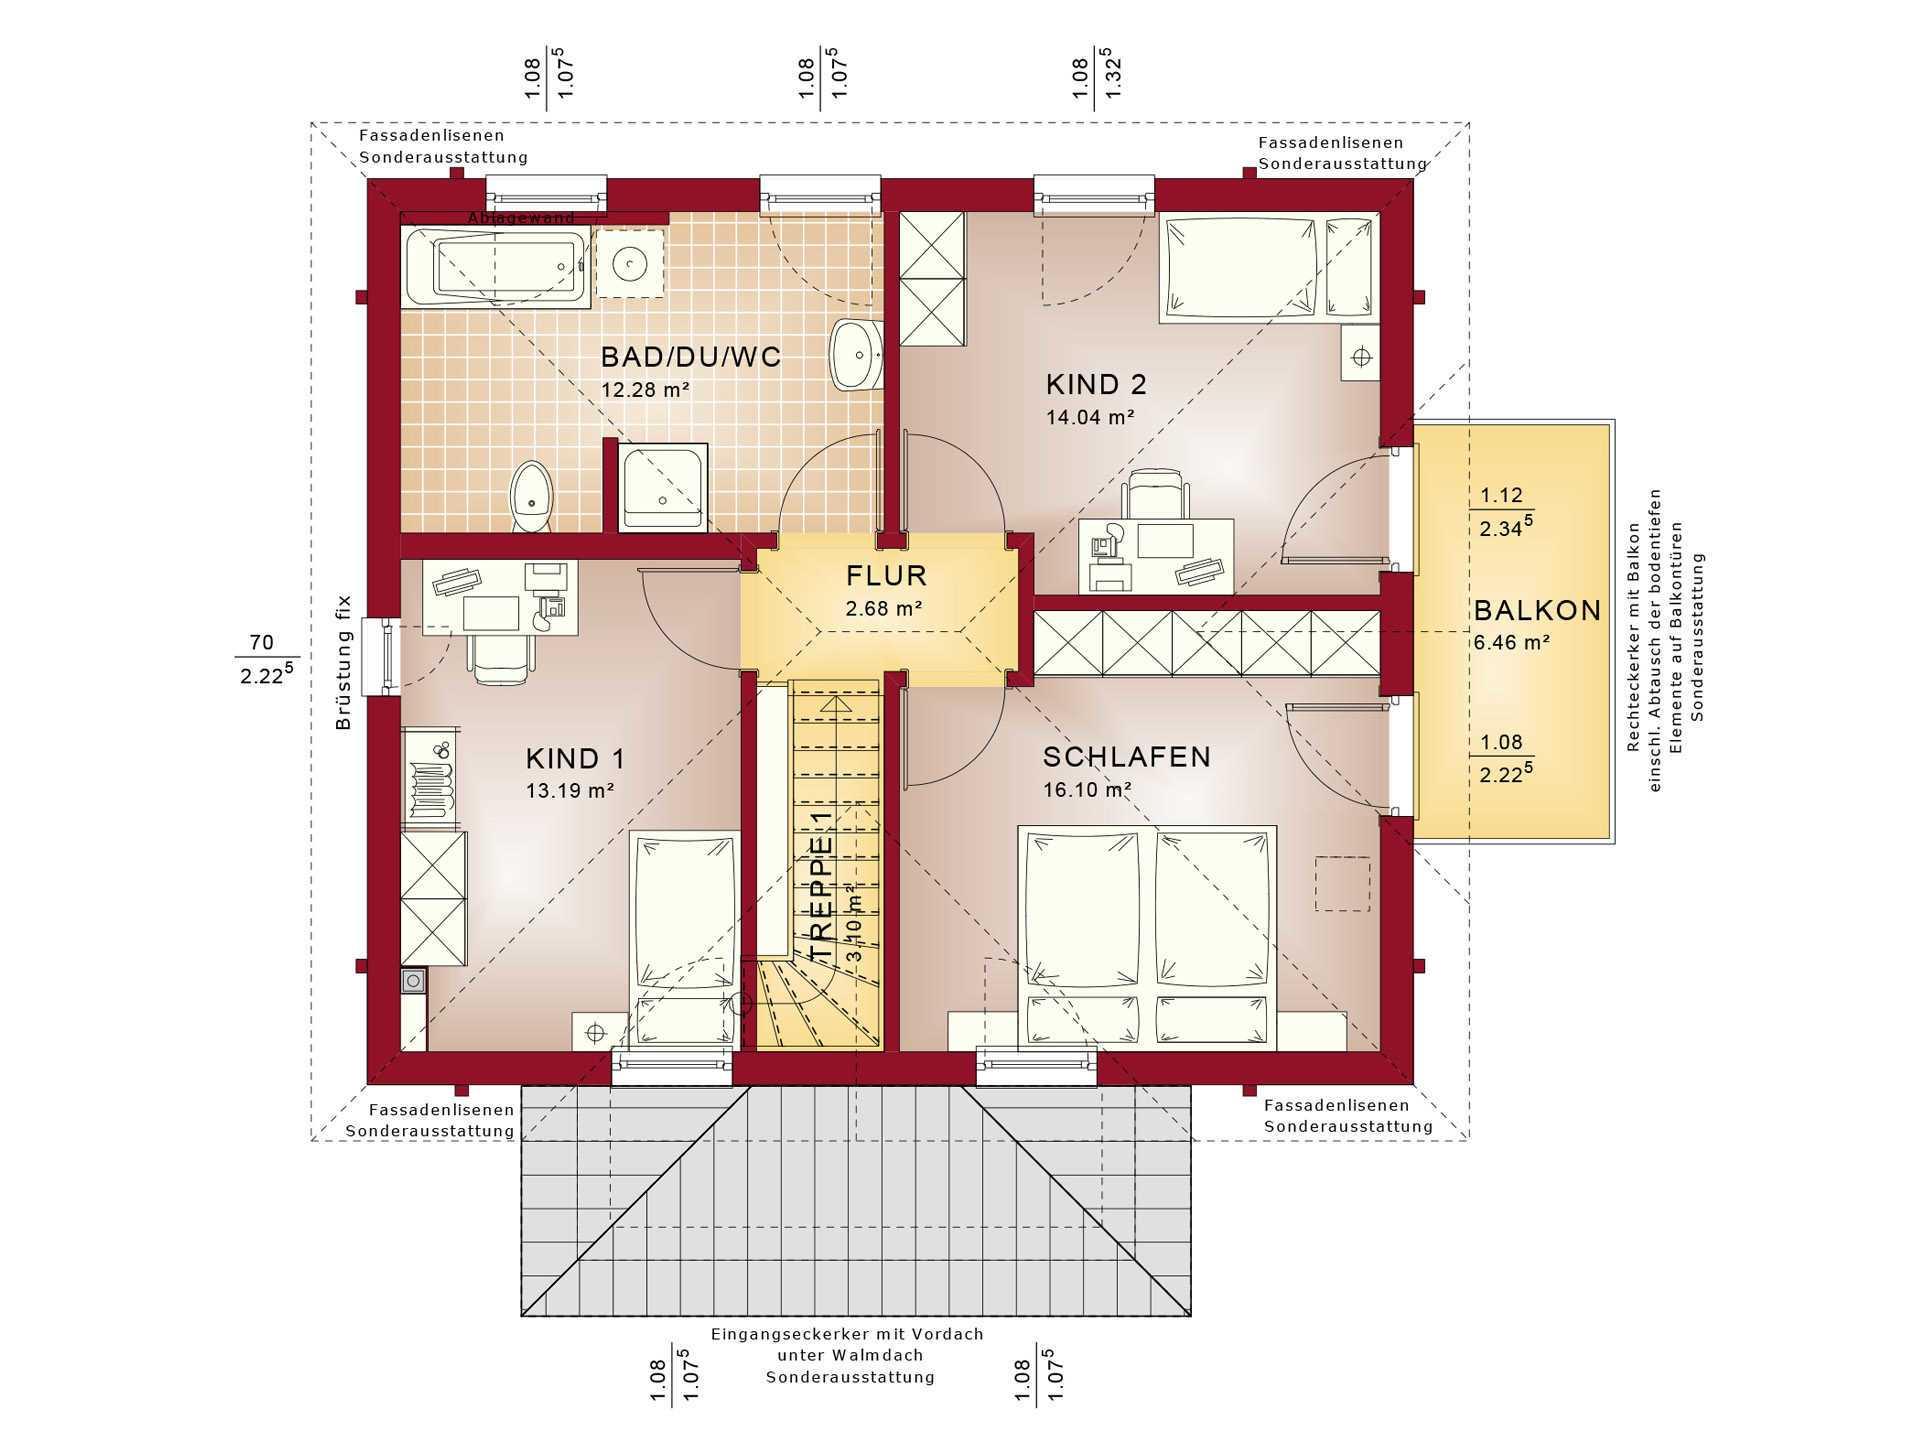 Haus SOLUTION 124 V8 Grundriss OG von Living Haus